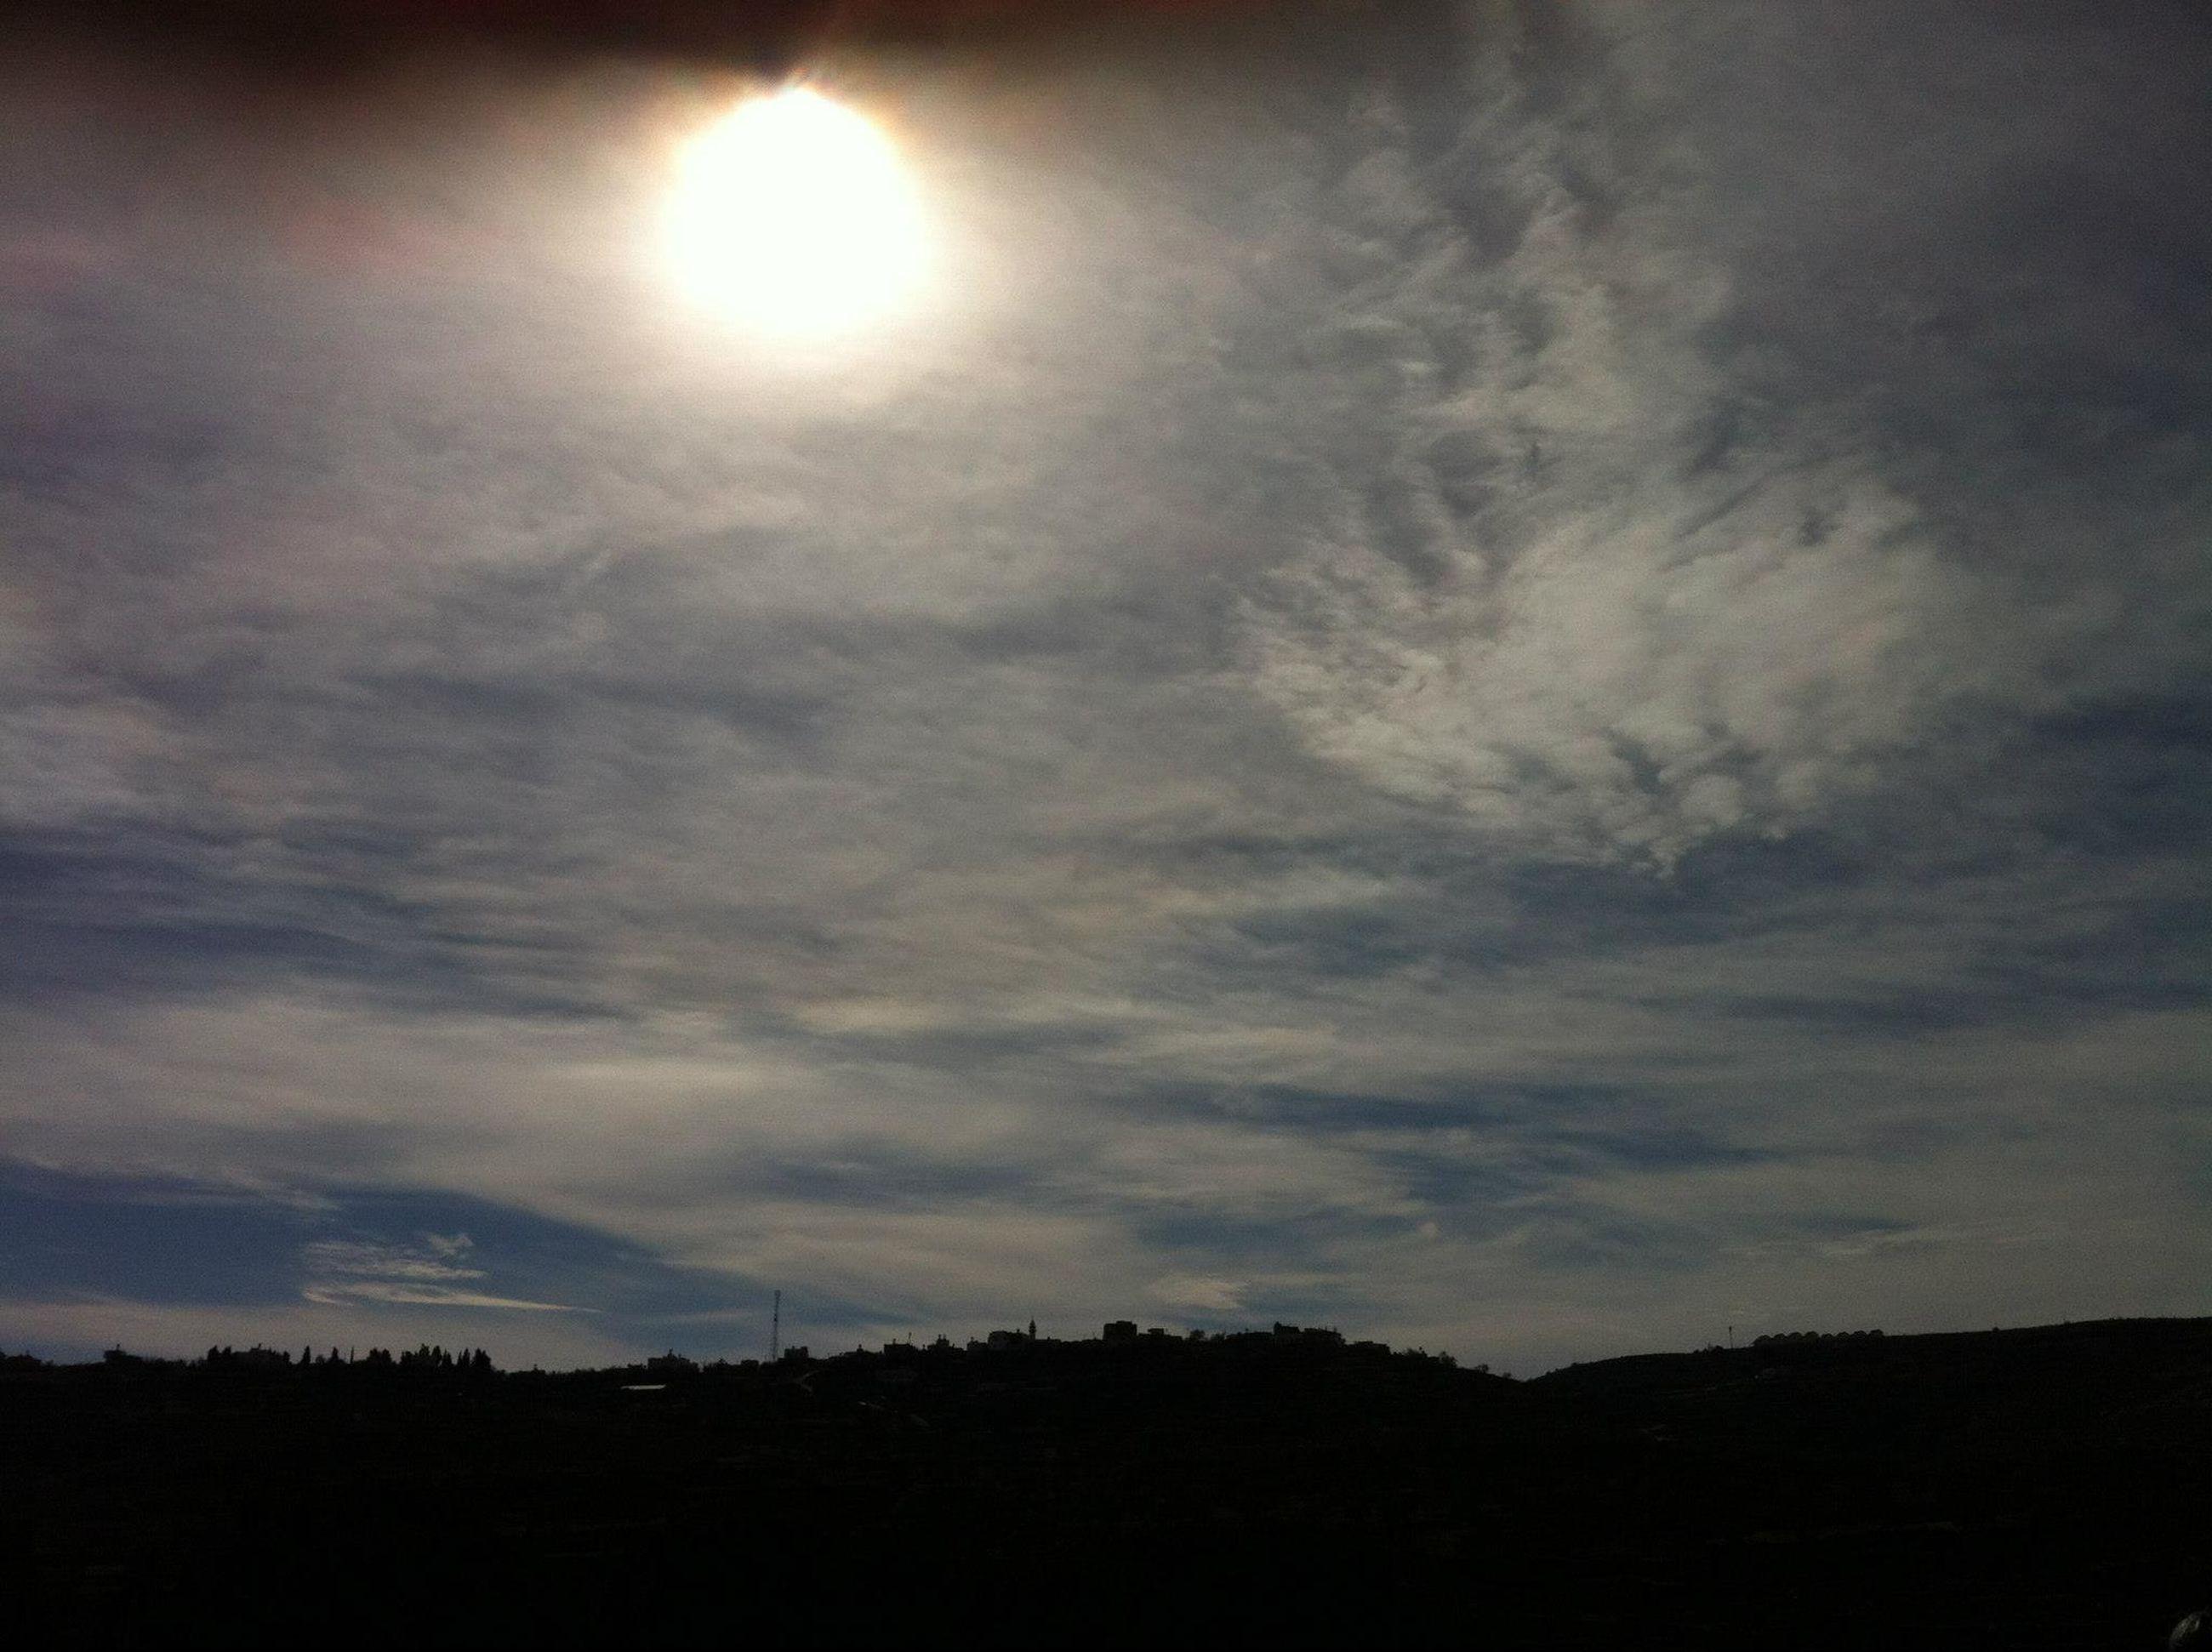 silhouette, sky, tranquil scene, tranquility, scenics, sun, beauty in nature, sunset, cloud - sky, landscape, nature, cloudy, sunbeam, idyllic, cloud, sunlight, dark, low angle view, outdoors, dusk